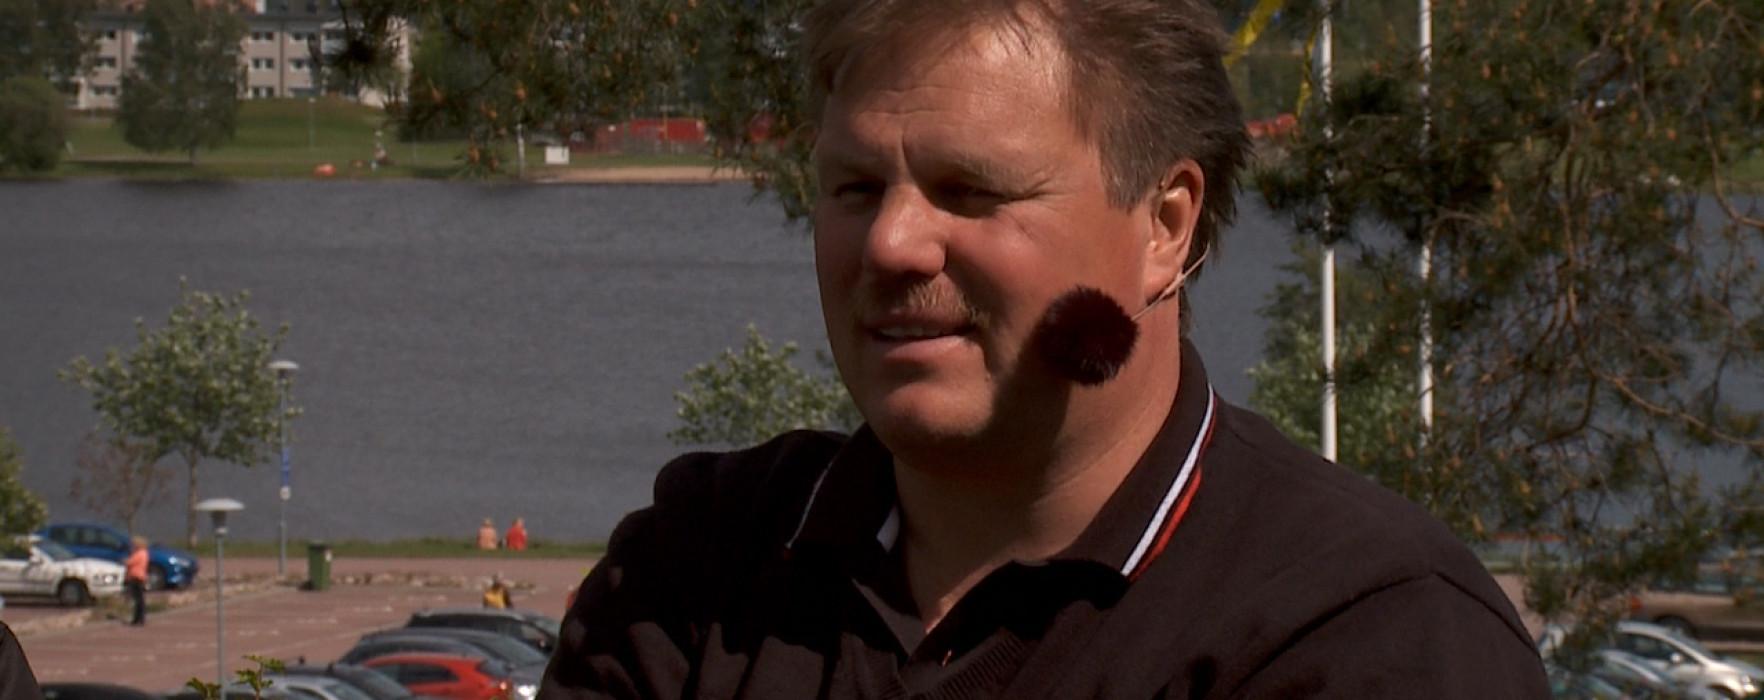 Glimt Sport – Tommy Samuelsson och Leif Carlsson